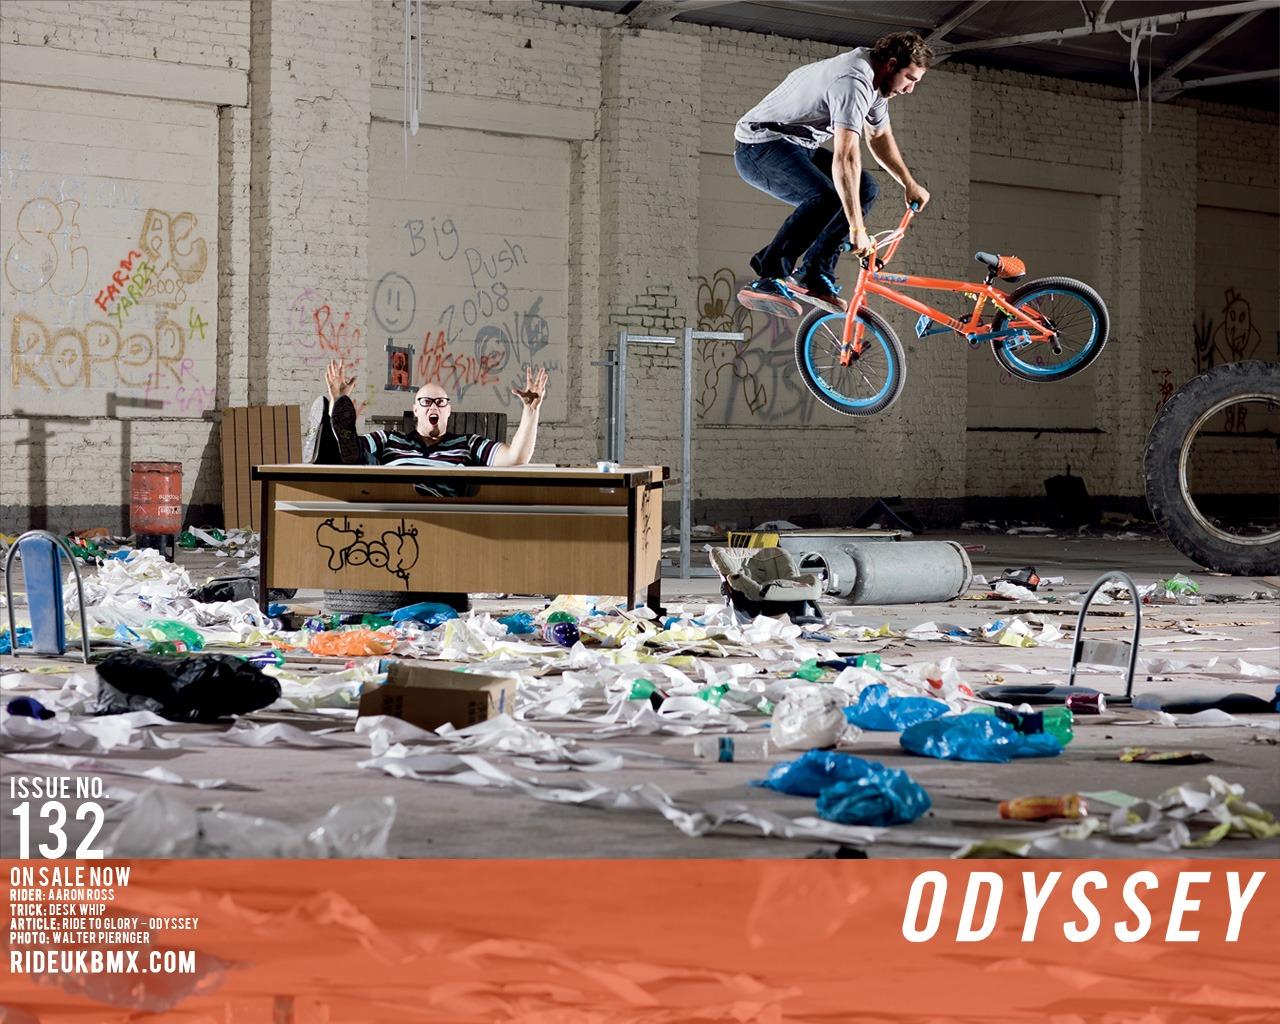 Odyssey desktop wallpaper!